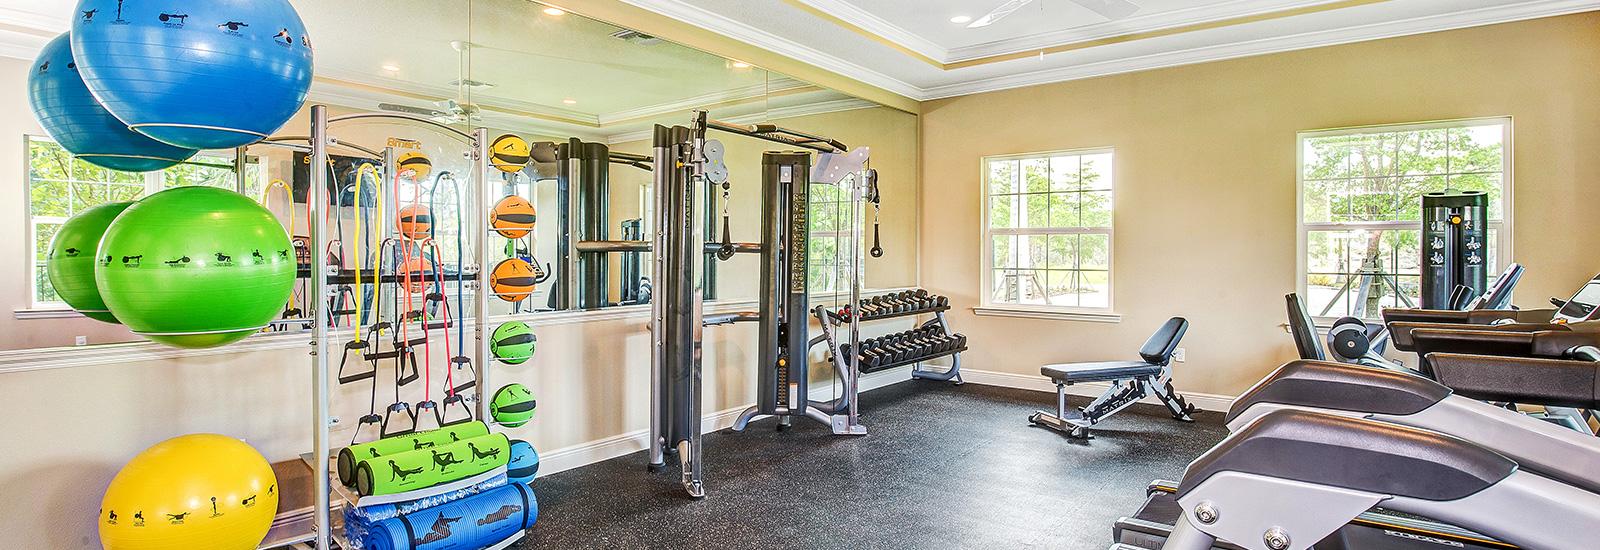 1600x550-CoralCaye-gym.jpg